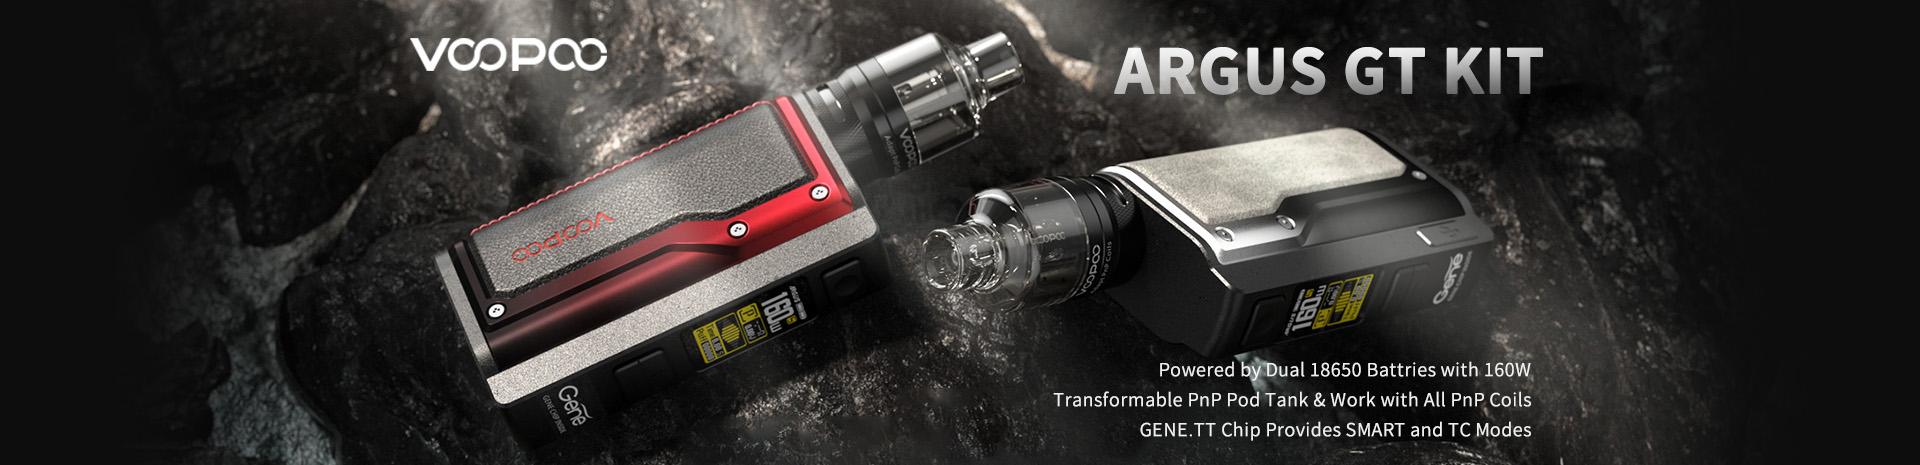 VOOPOO Argus GT Kit Banner